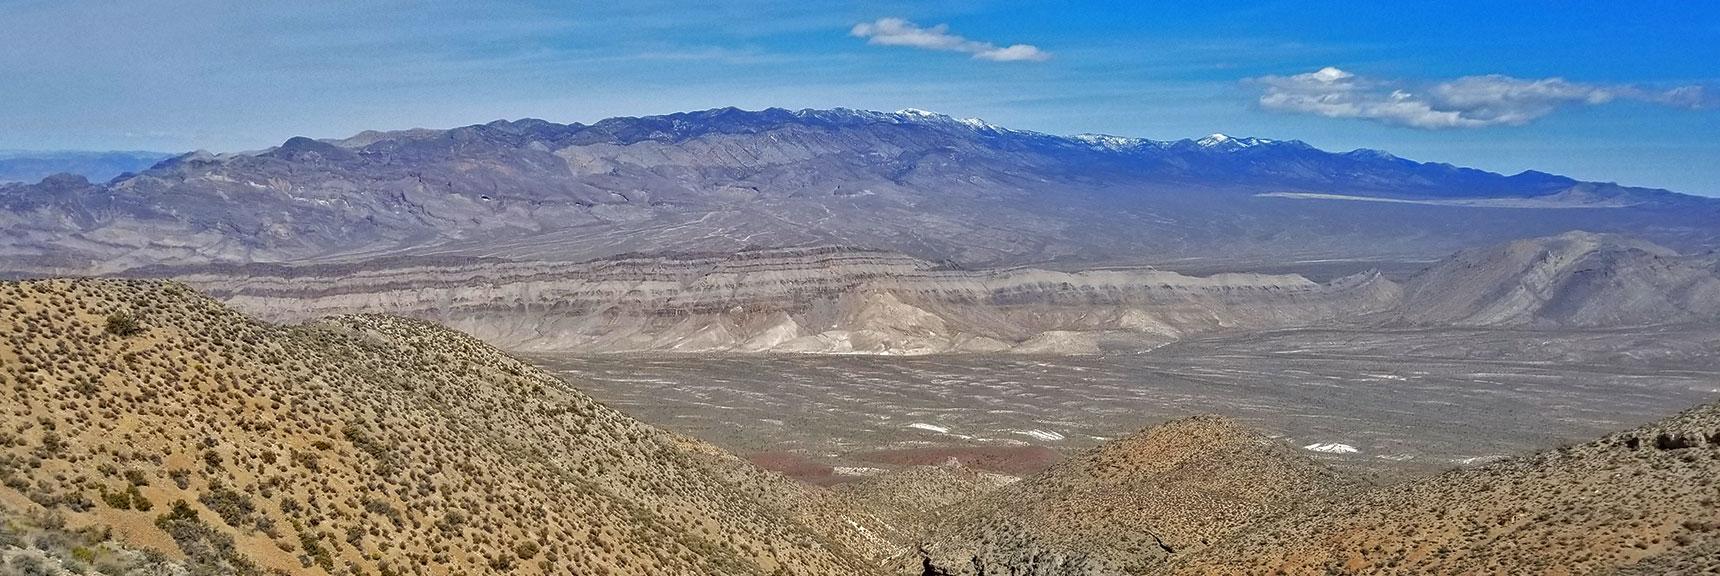 View of the Sheep Range from the Gass Peak Gauntlet Route | Gass Peak Eastern Summit Ultra-marathon Adventure, Nevada